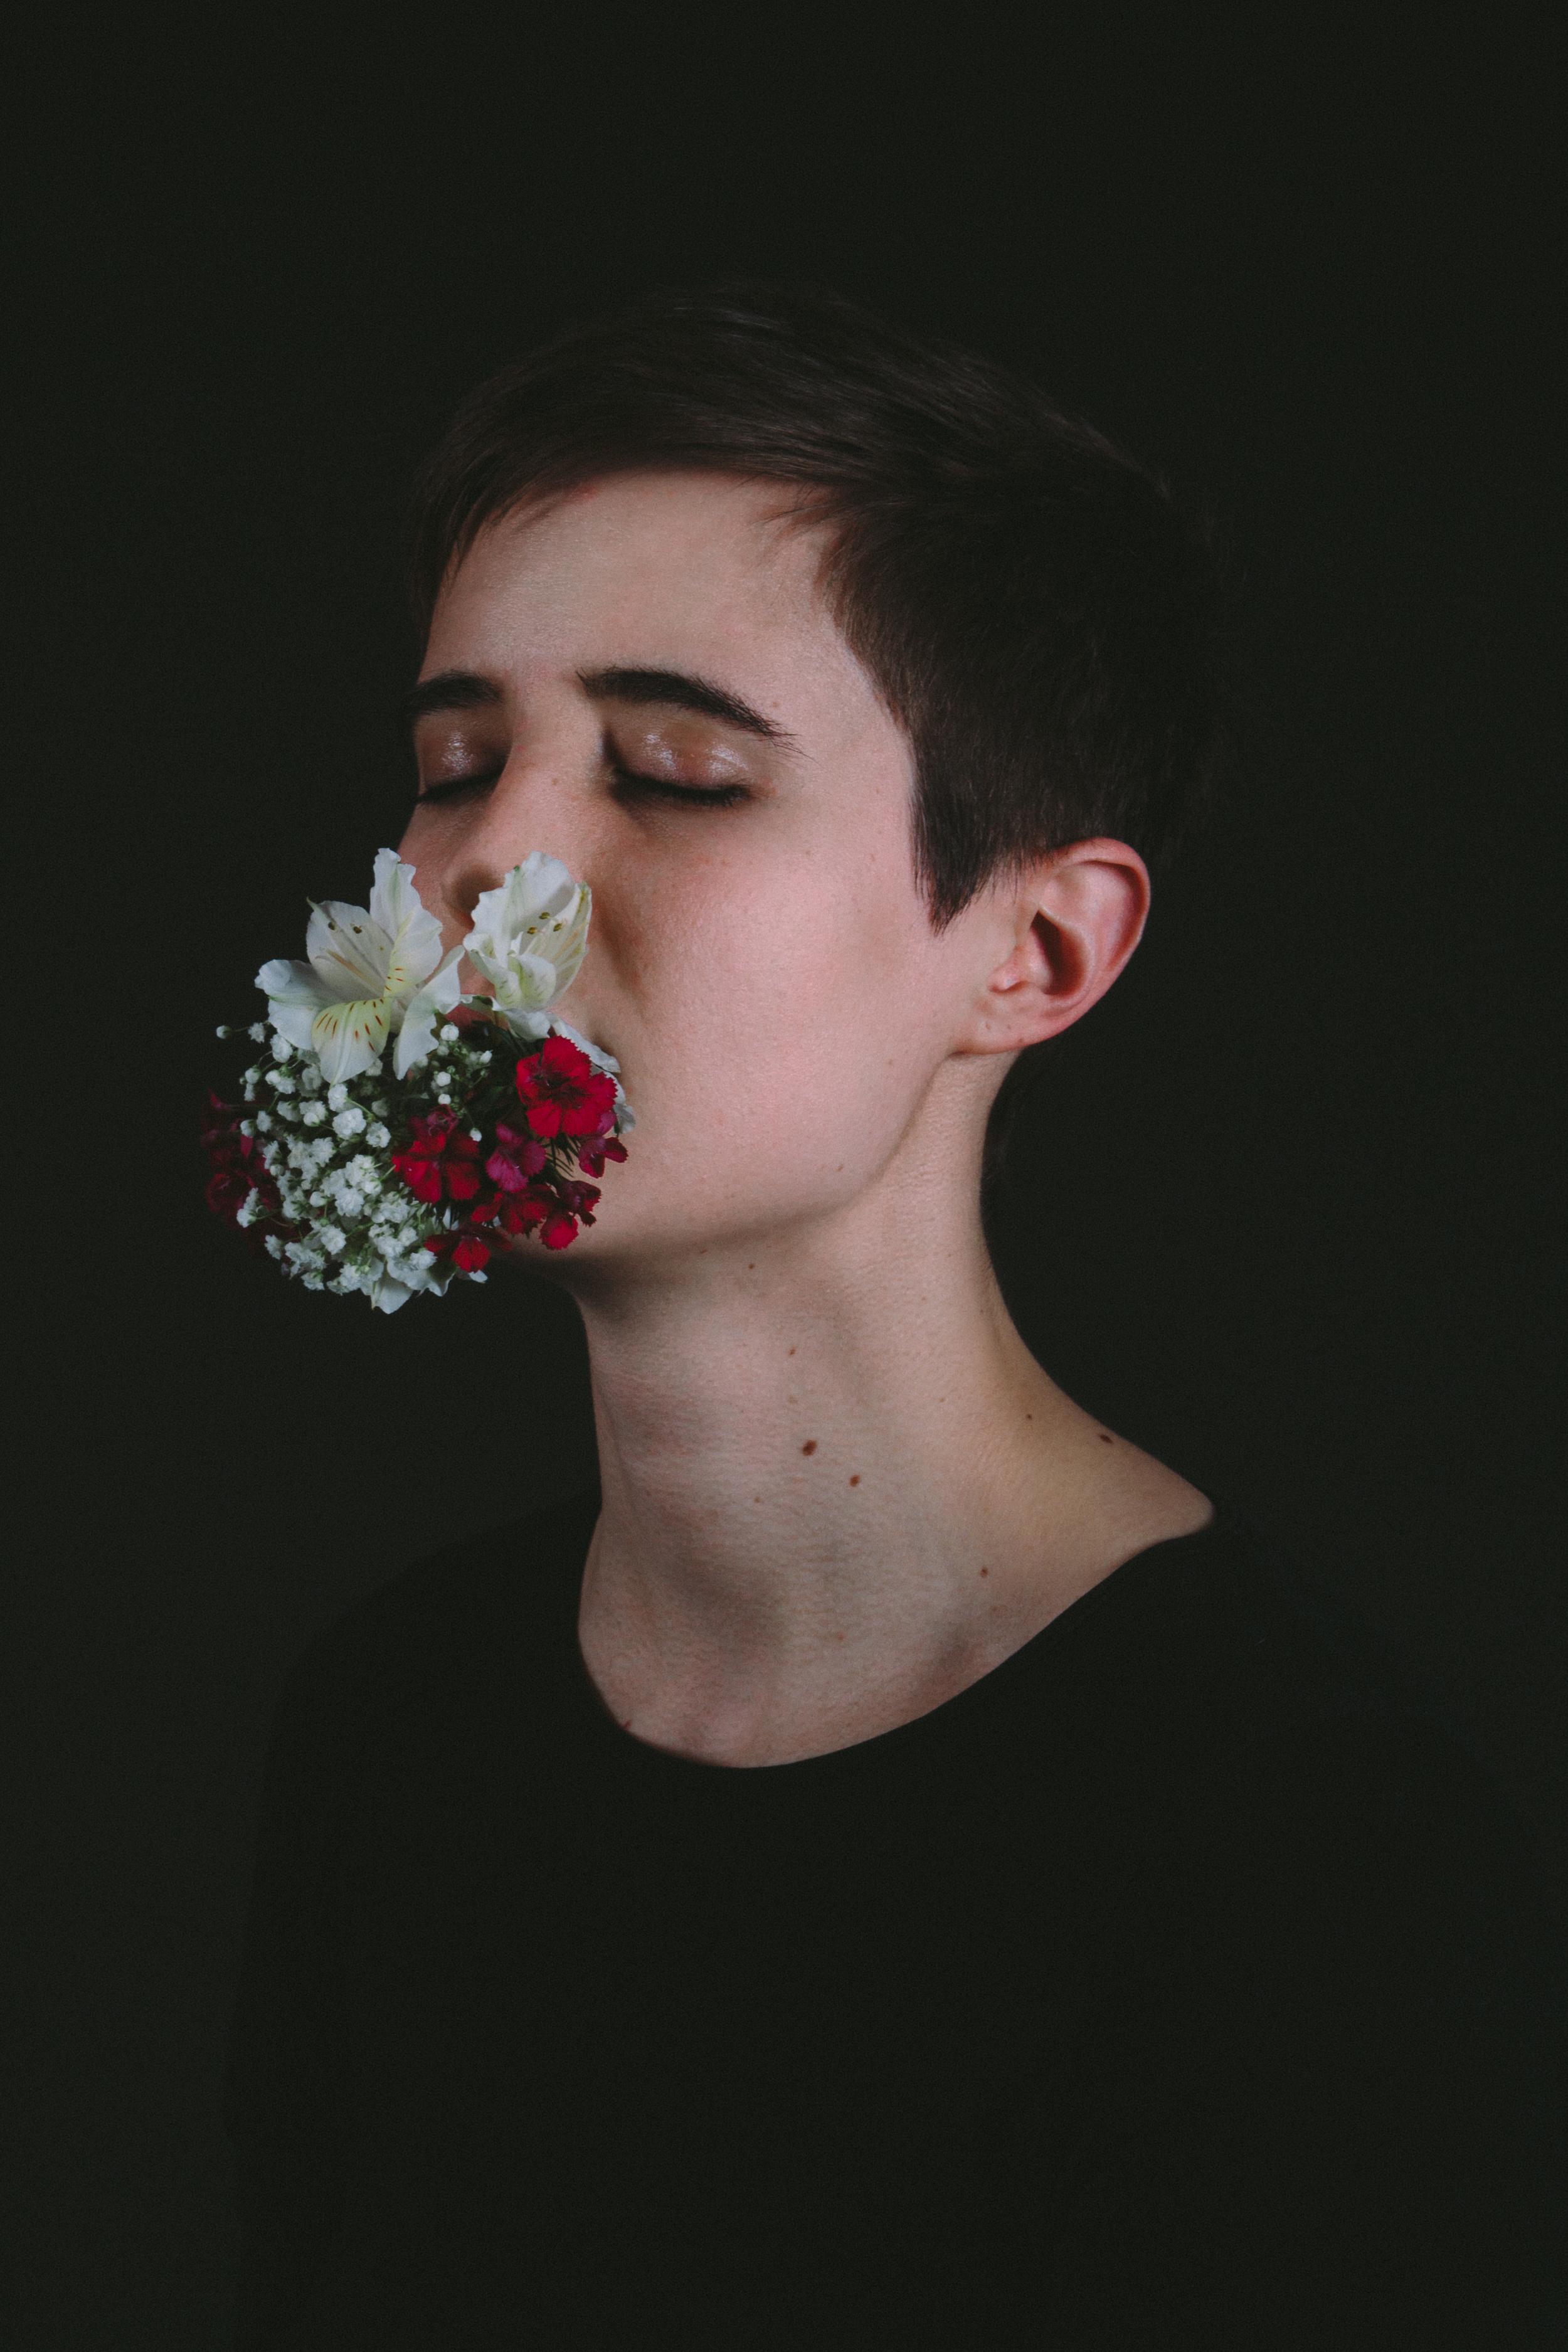 hannah_flowers.jpg